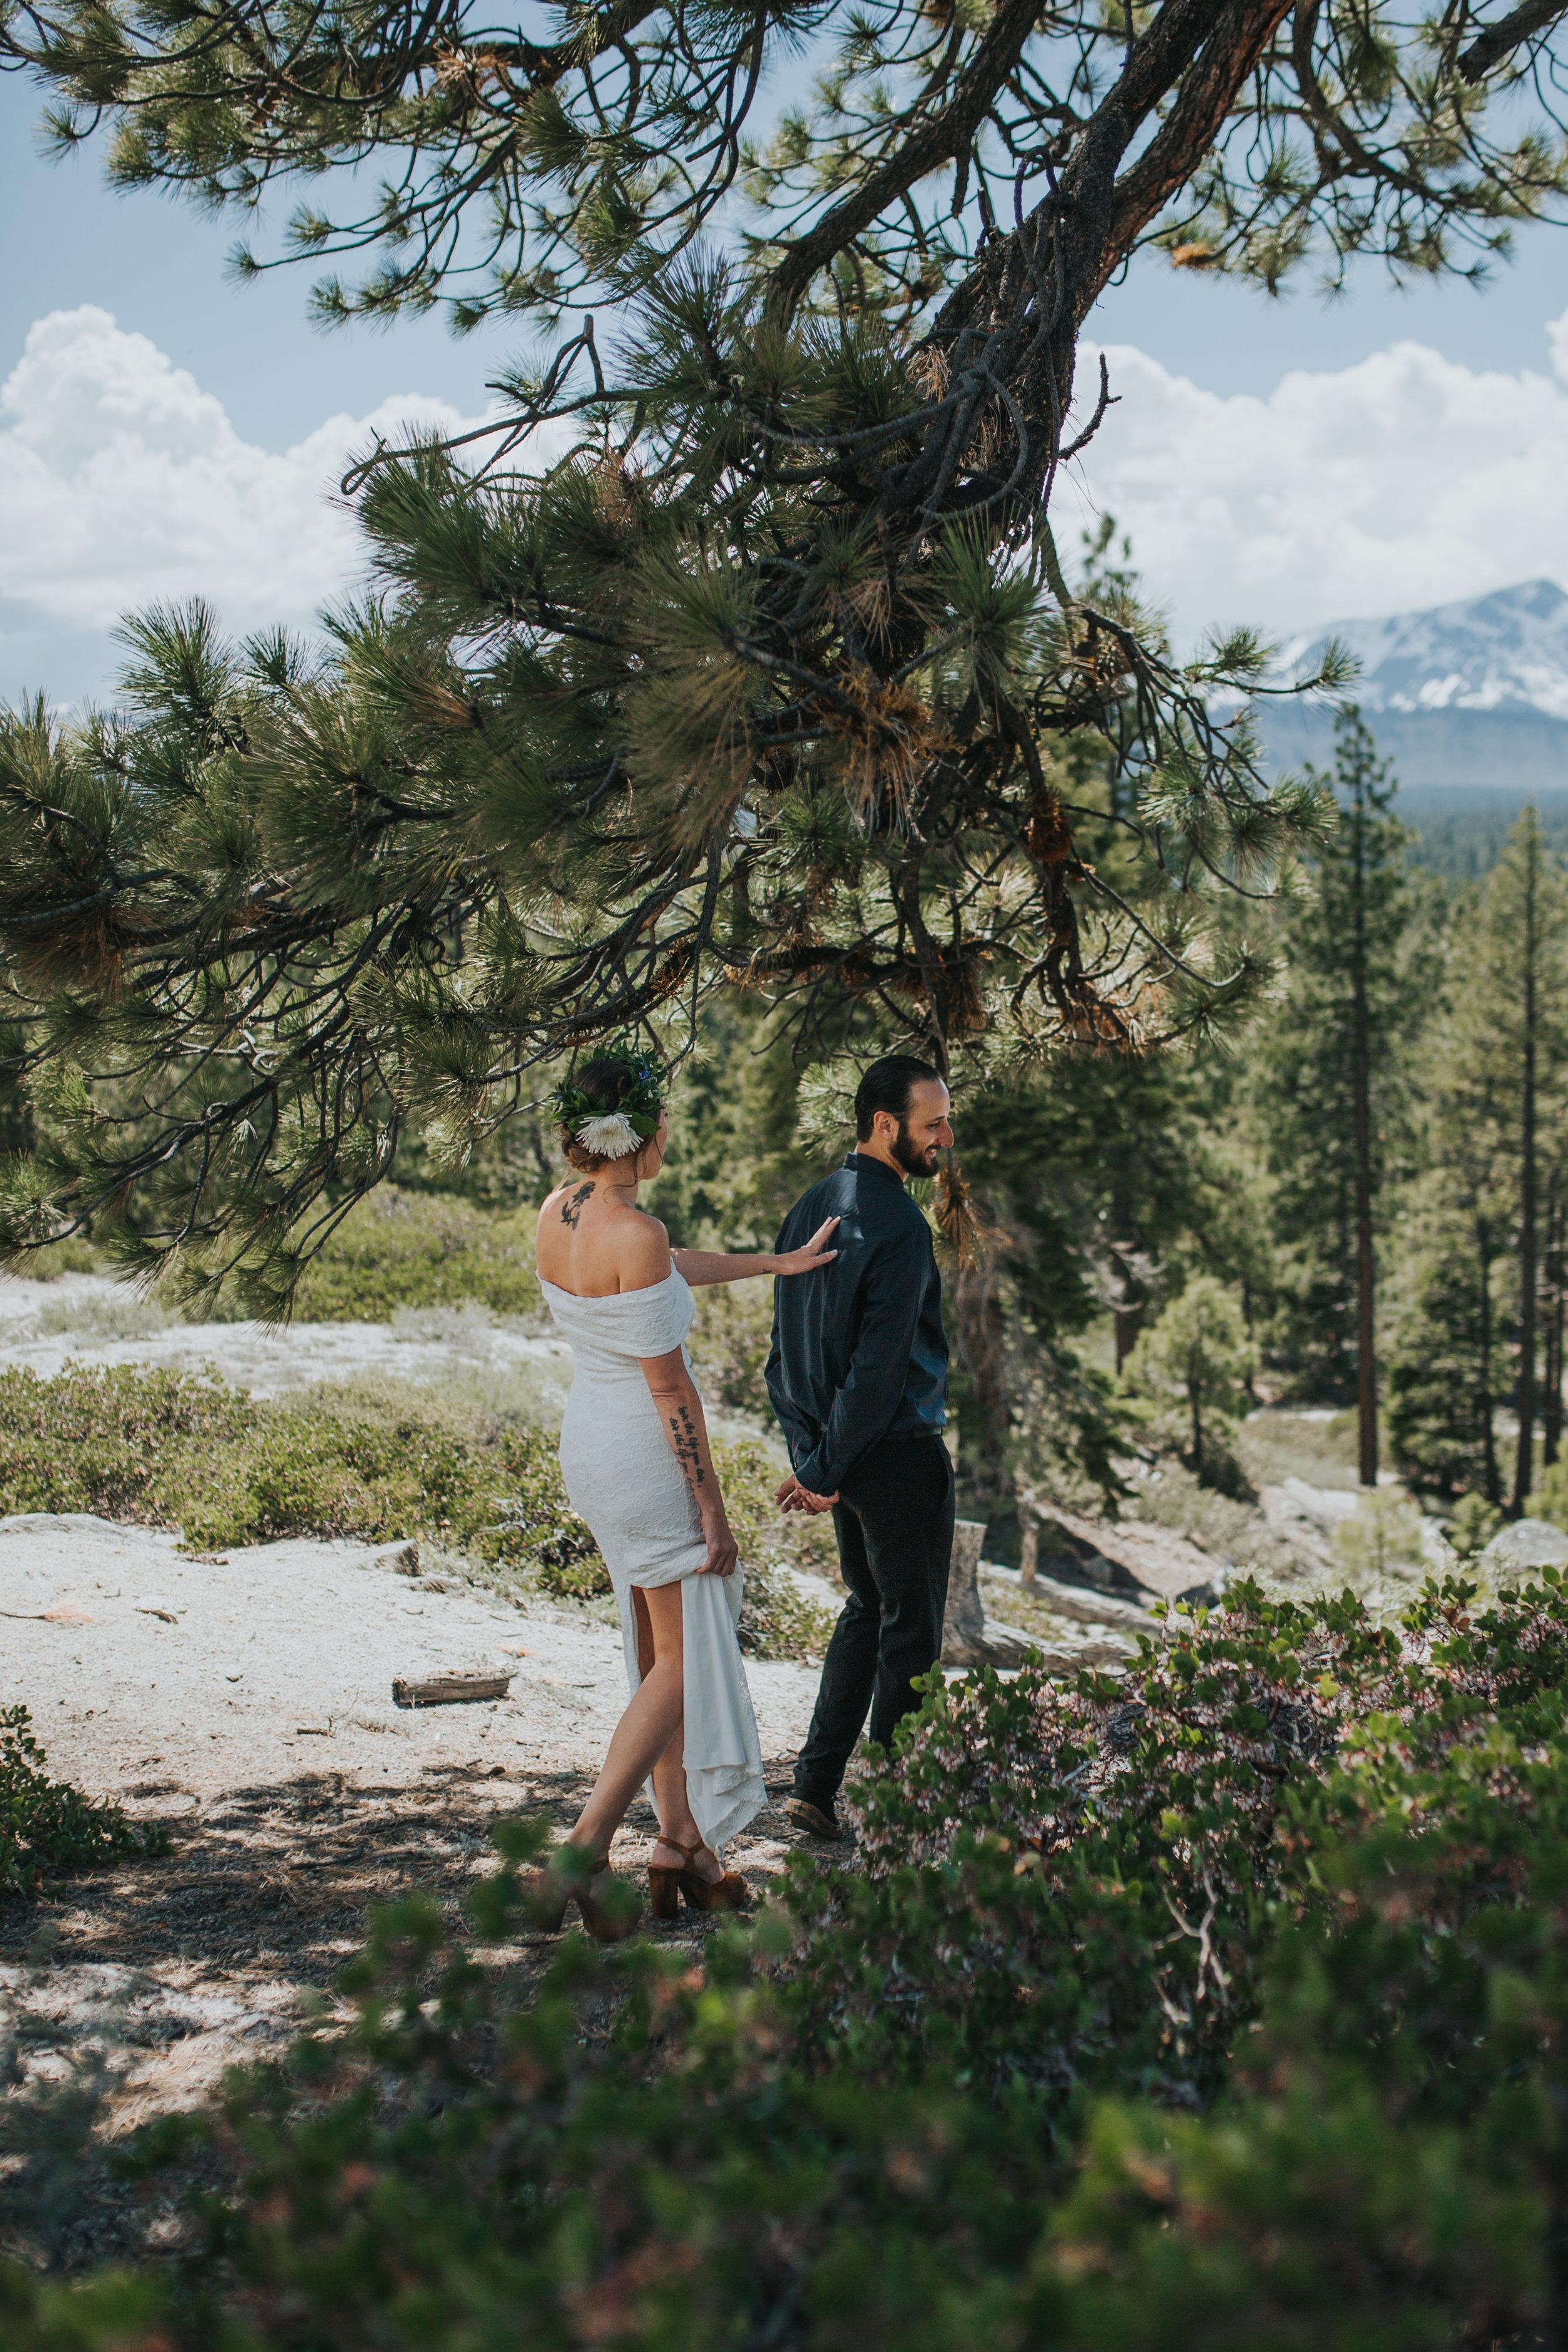 south-lake-tahoe-elopement-valerie-lendvay-photo-005.jpg